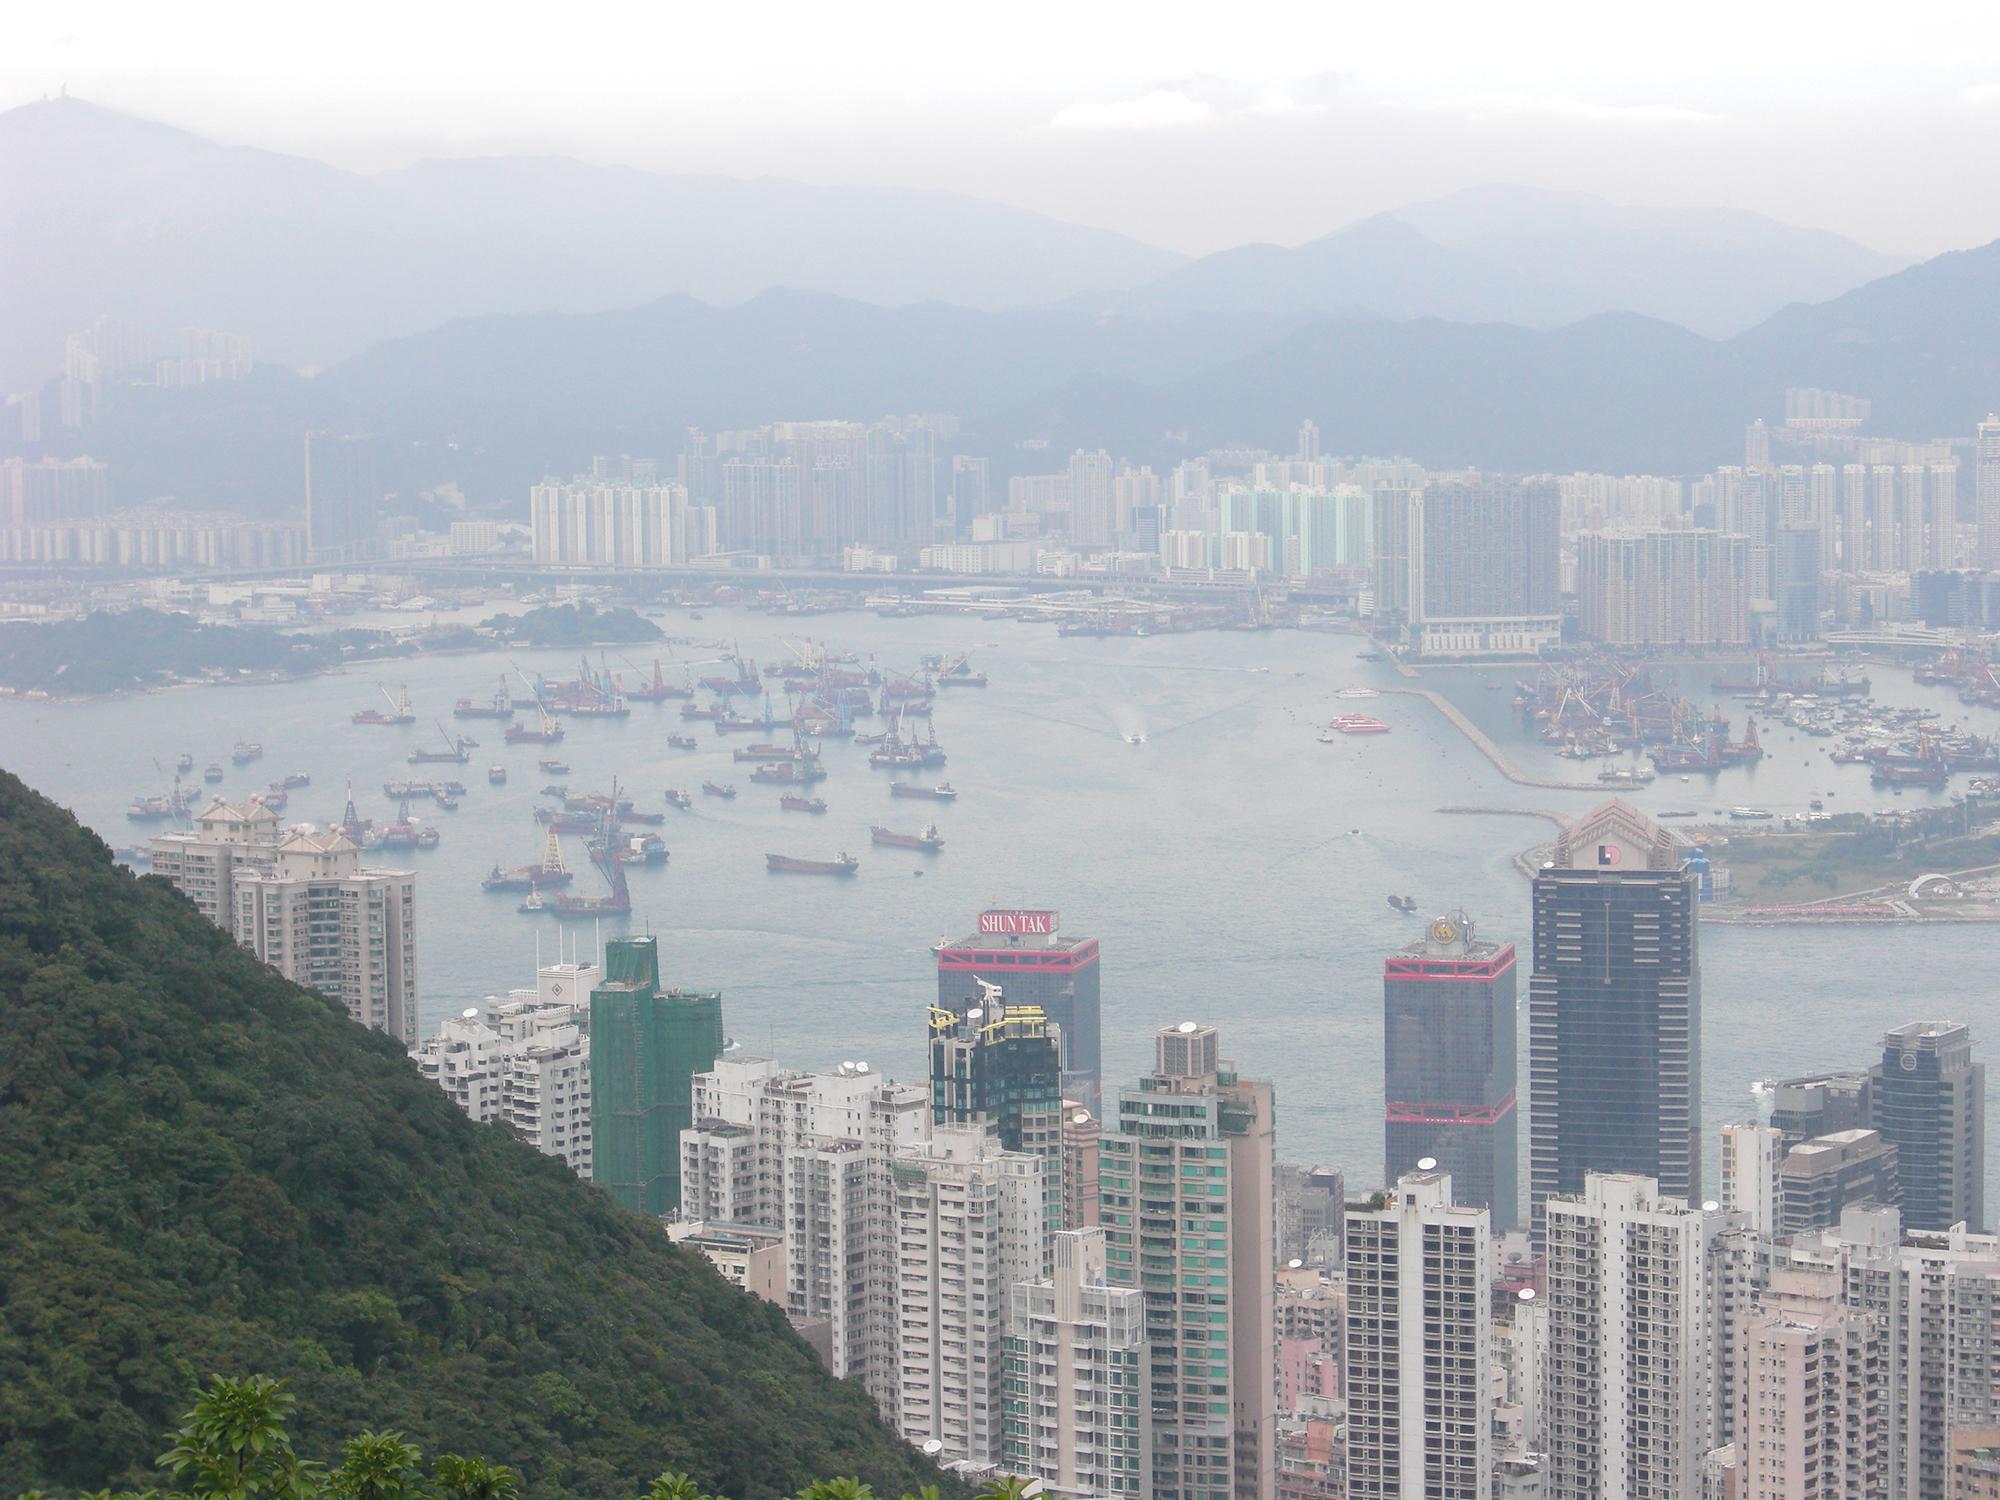 Hong Kong azië China The Piek View Hong Kong city travel reis reizen lifestyle by linda